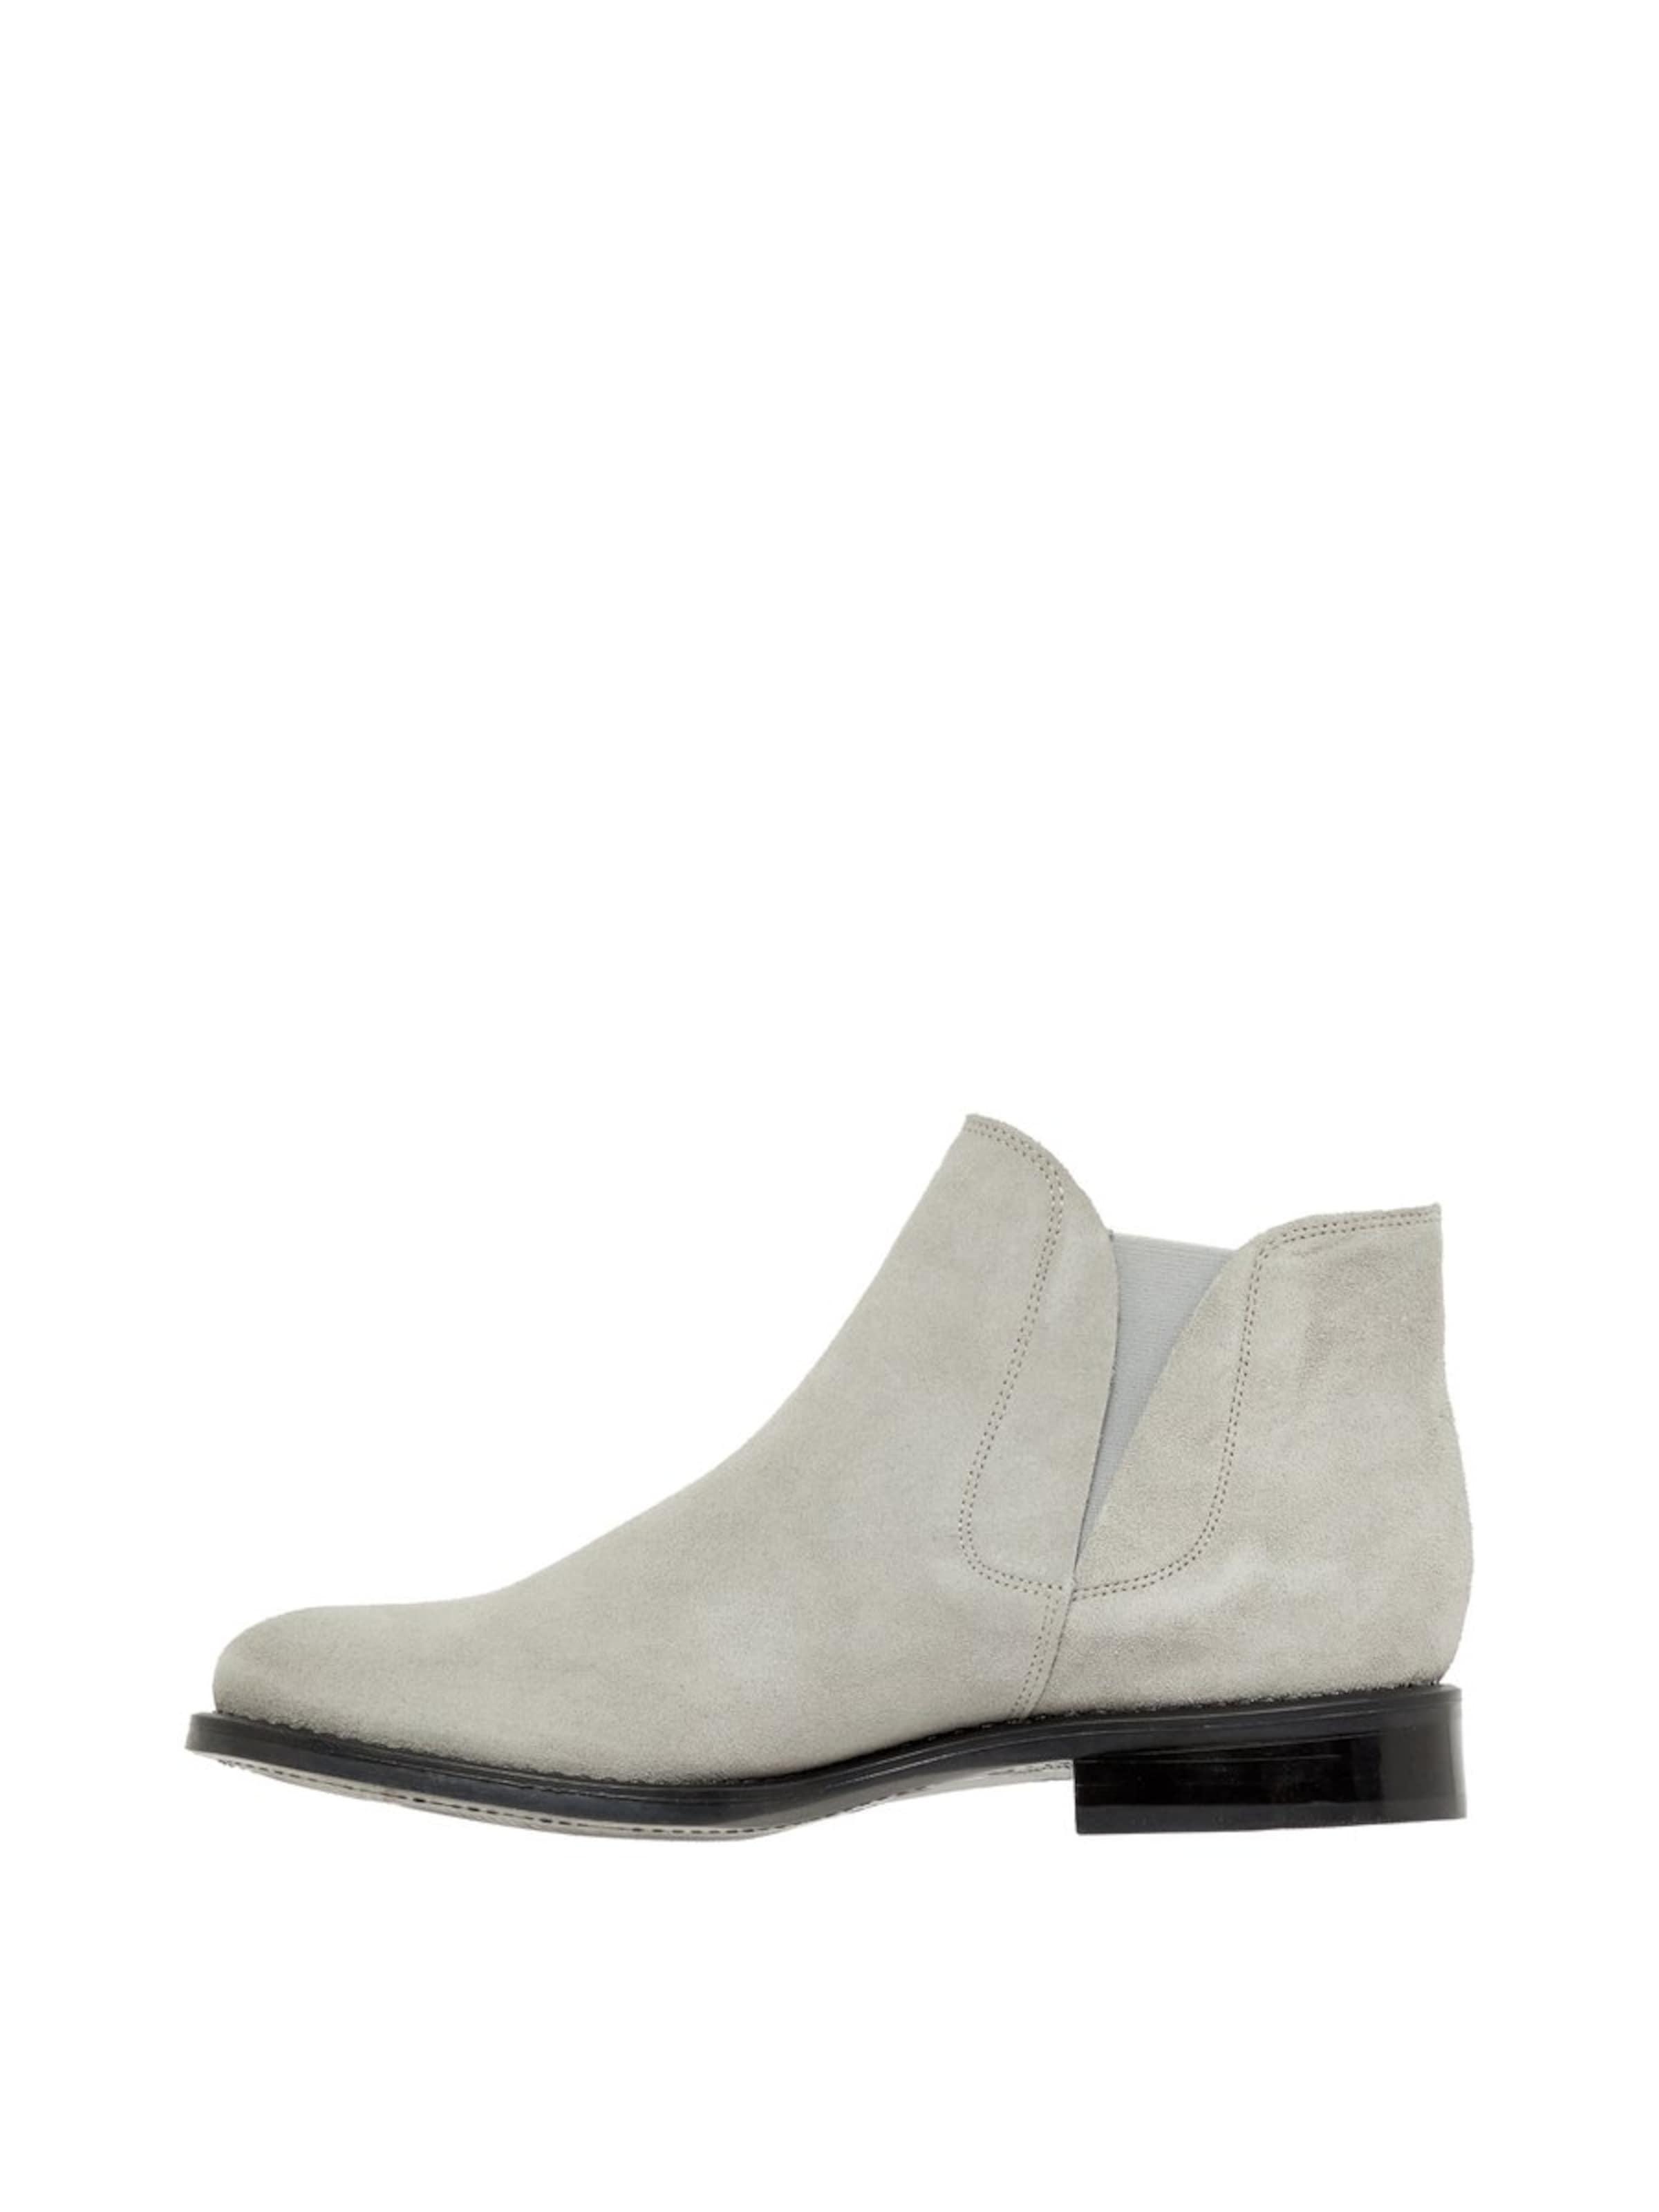 Boots Bianco Clair Gris En Chelsea WY2eED9HI